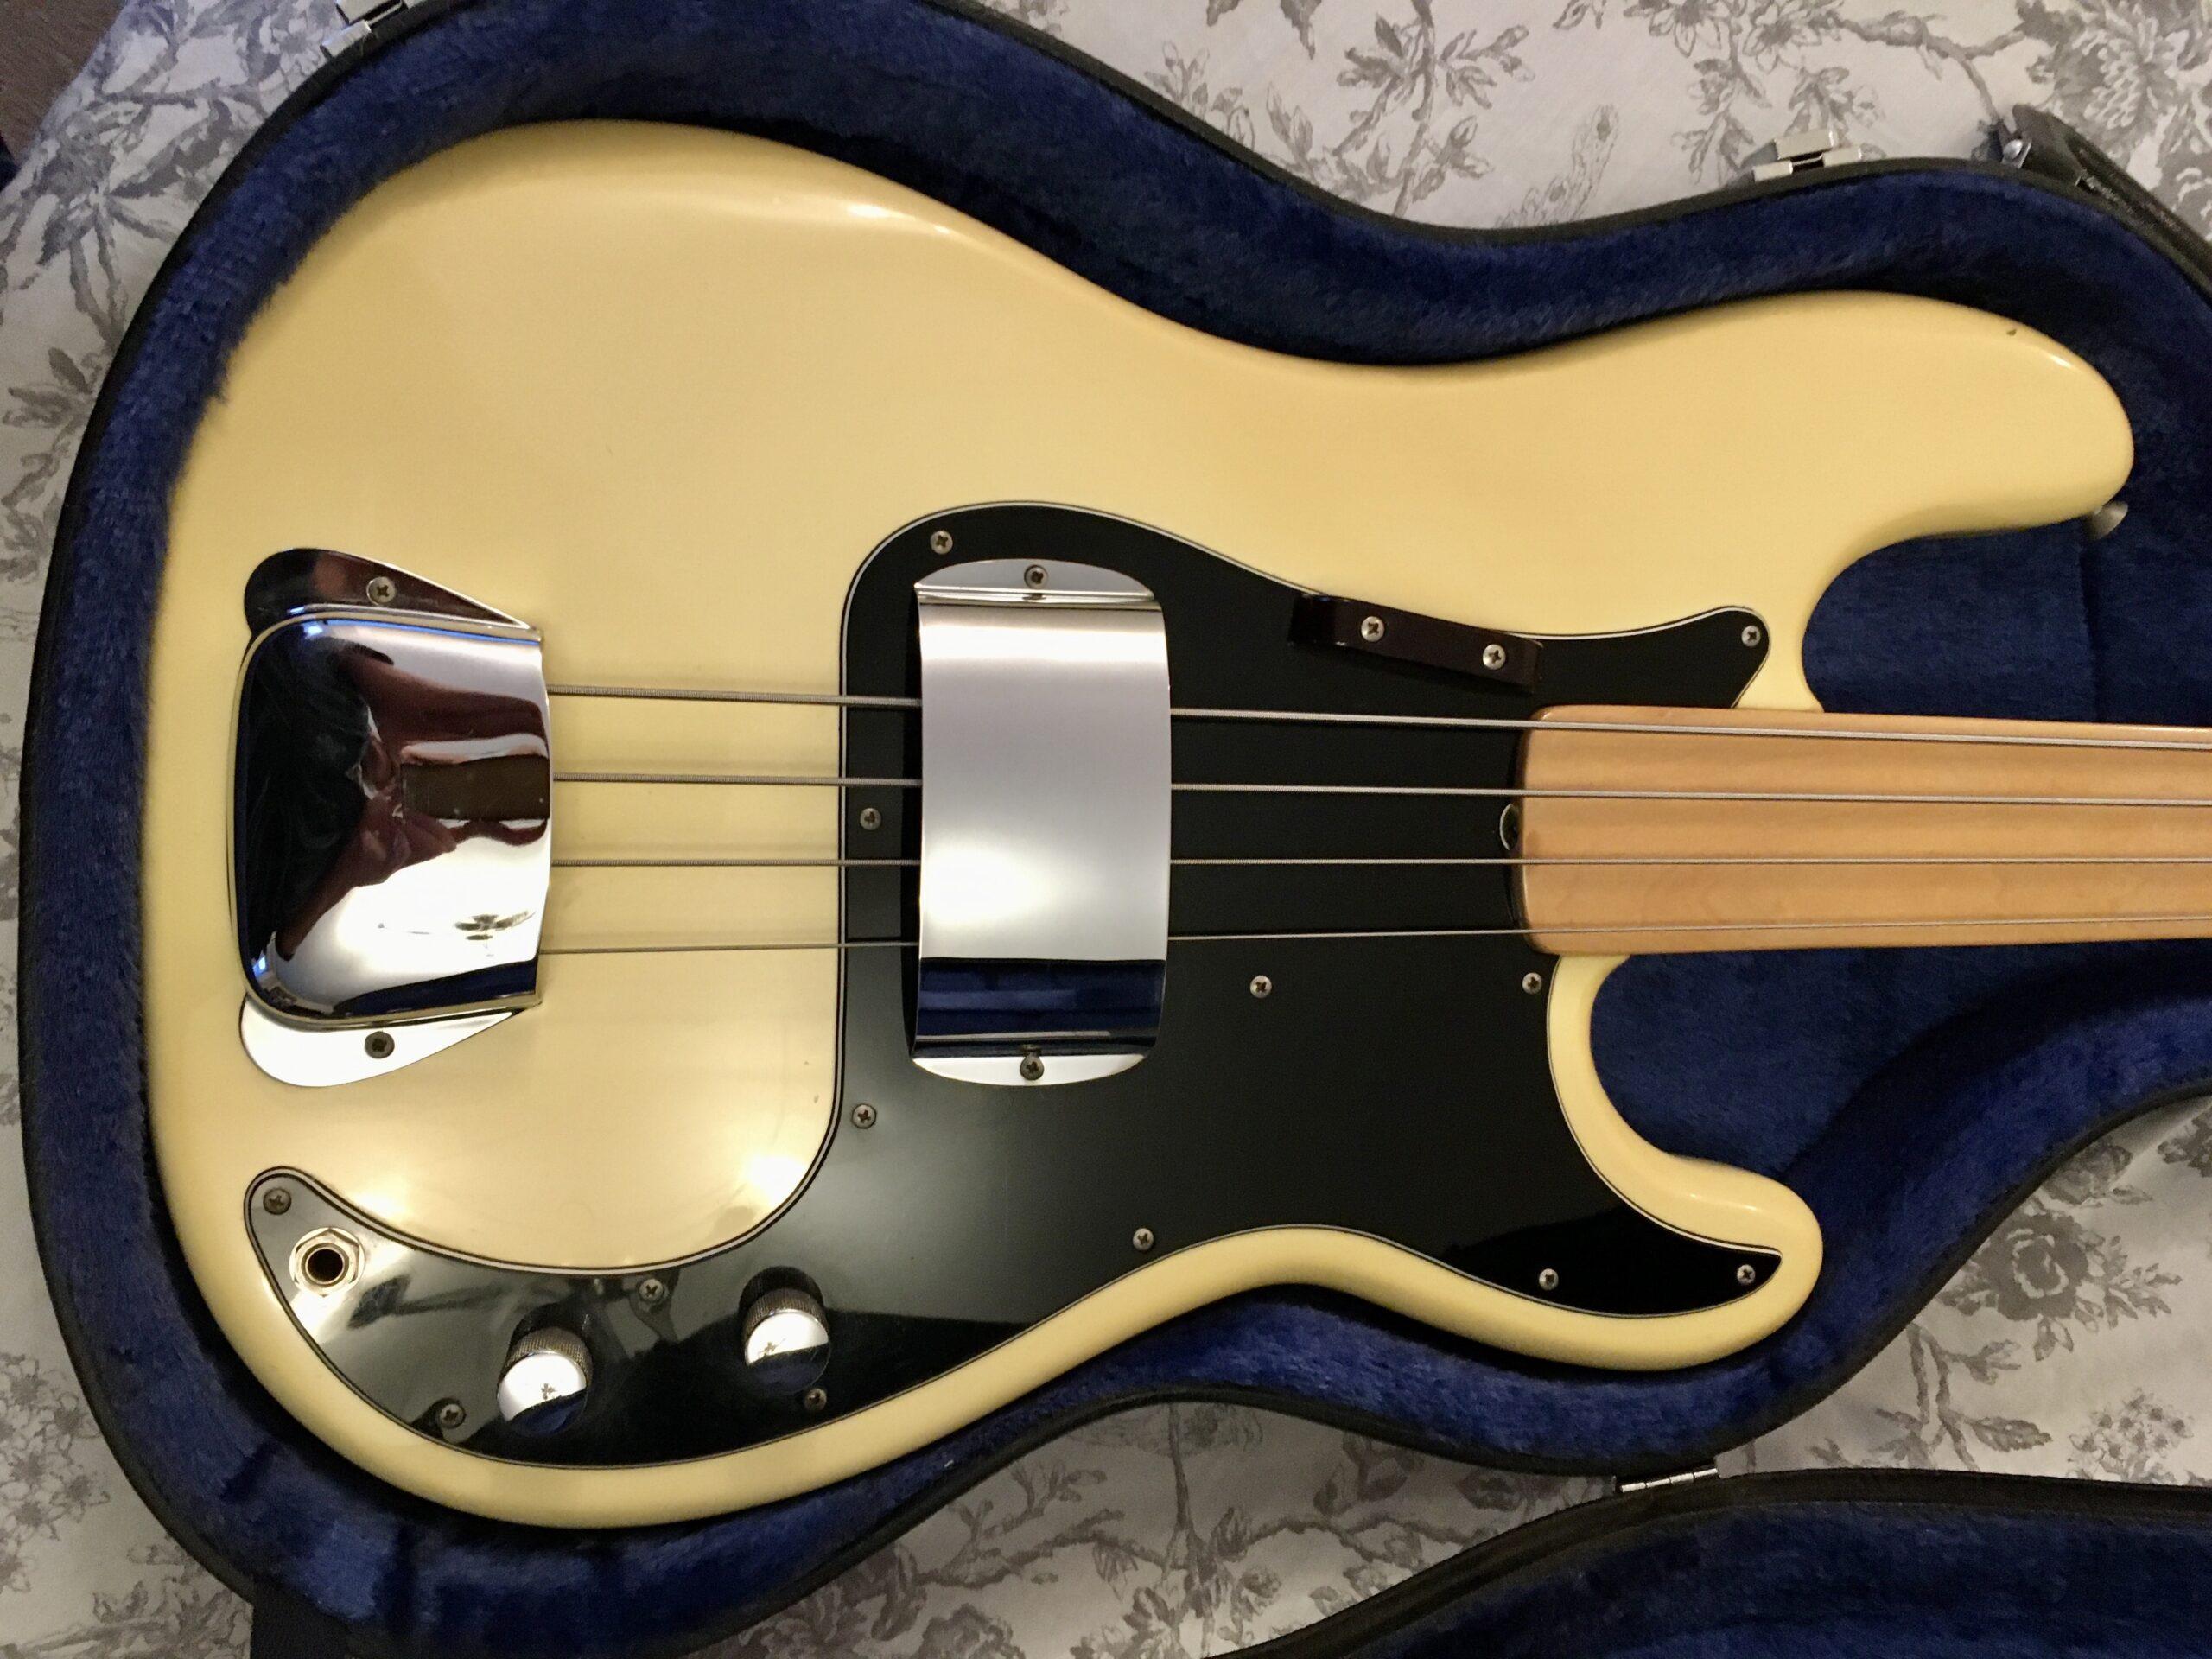 1977 Fender Precision Bass fretless